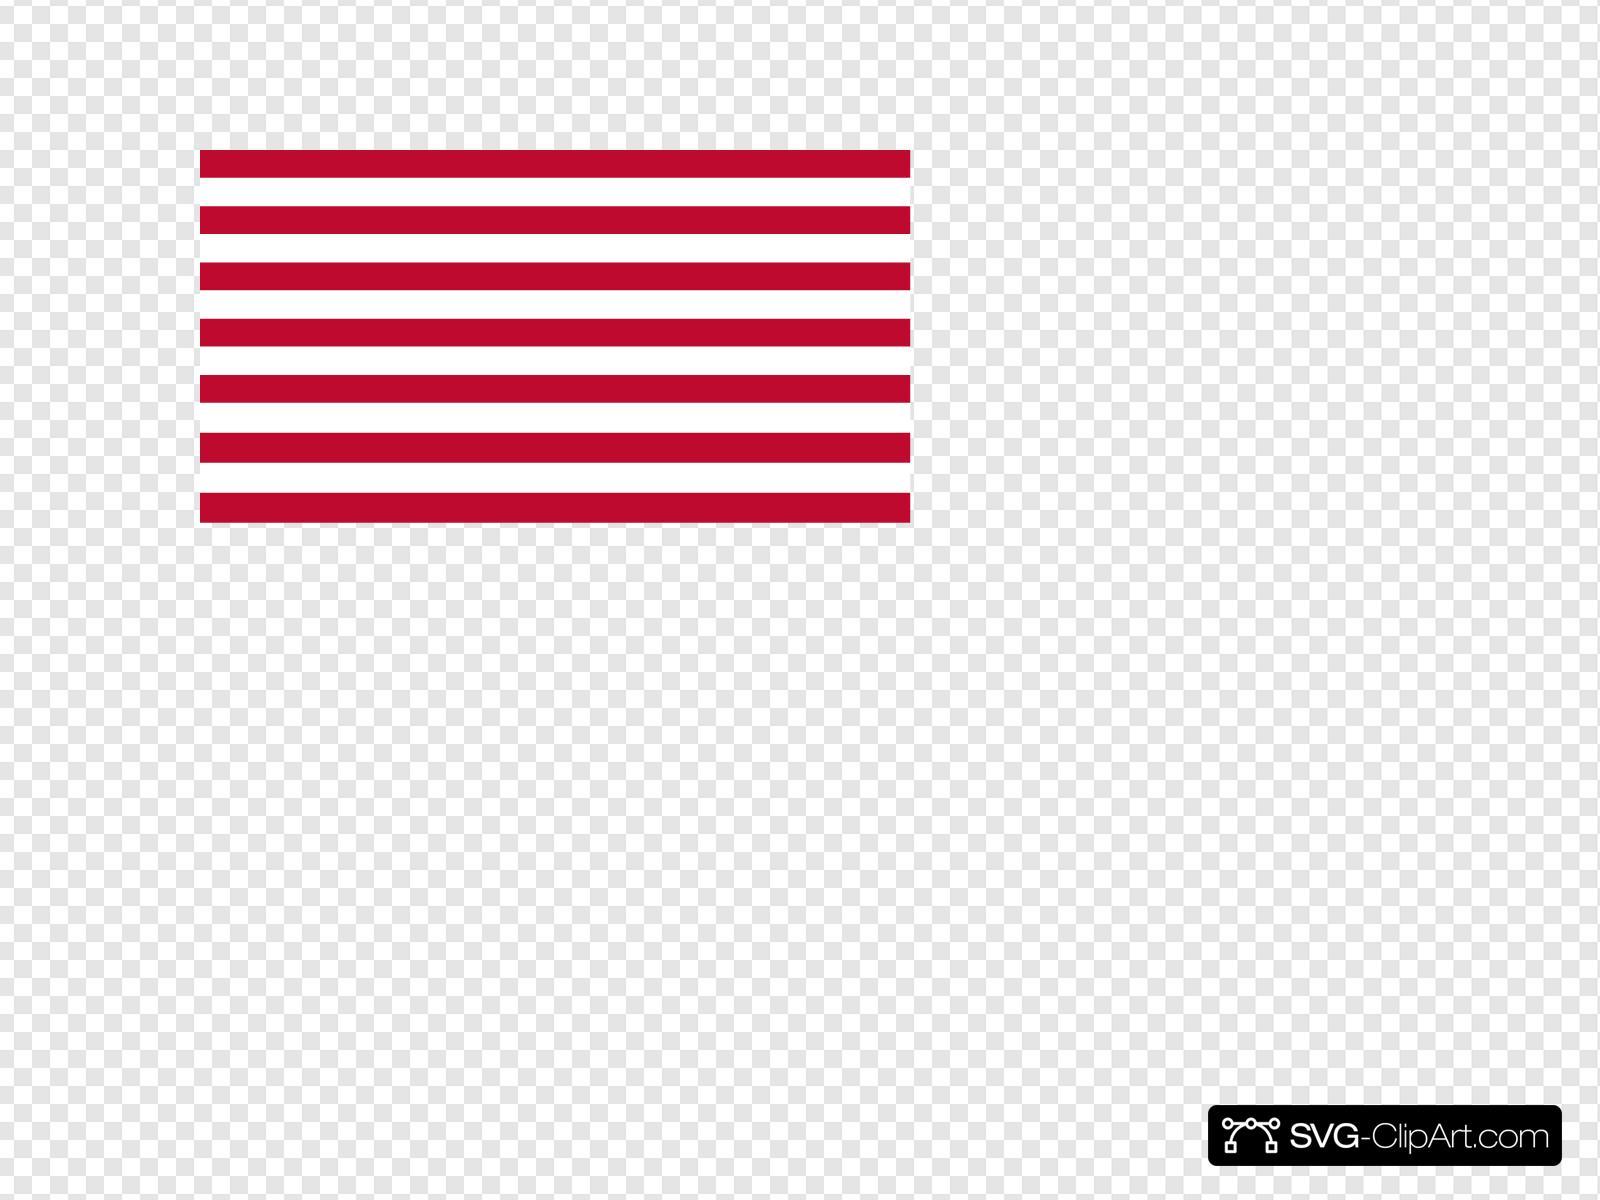 Red White Stripes Flag Clip Art at Clker.com - vector clip art online,  royalty free & public domain